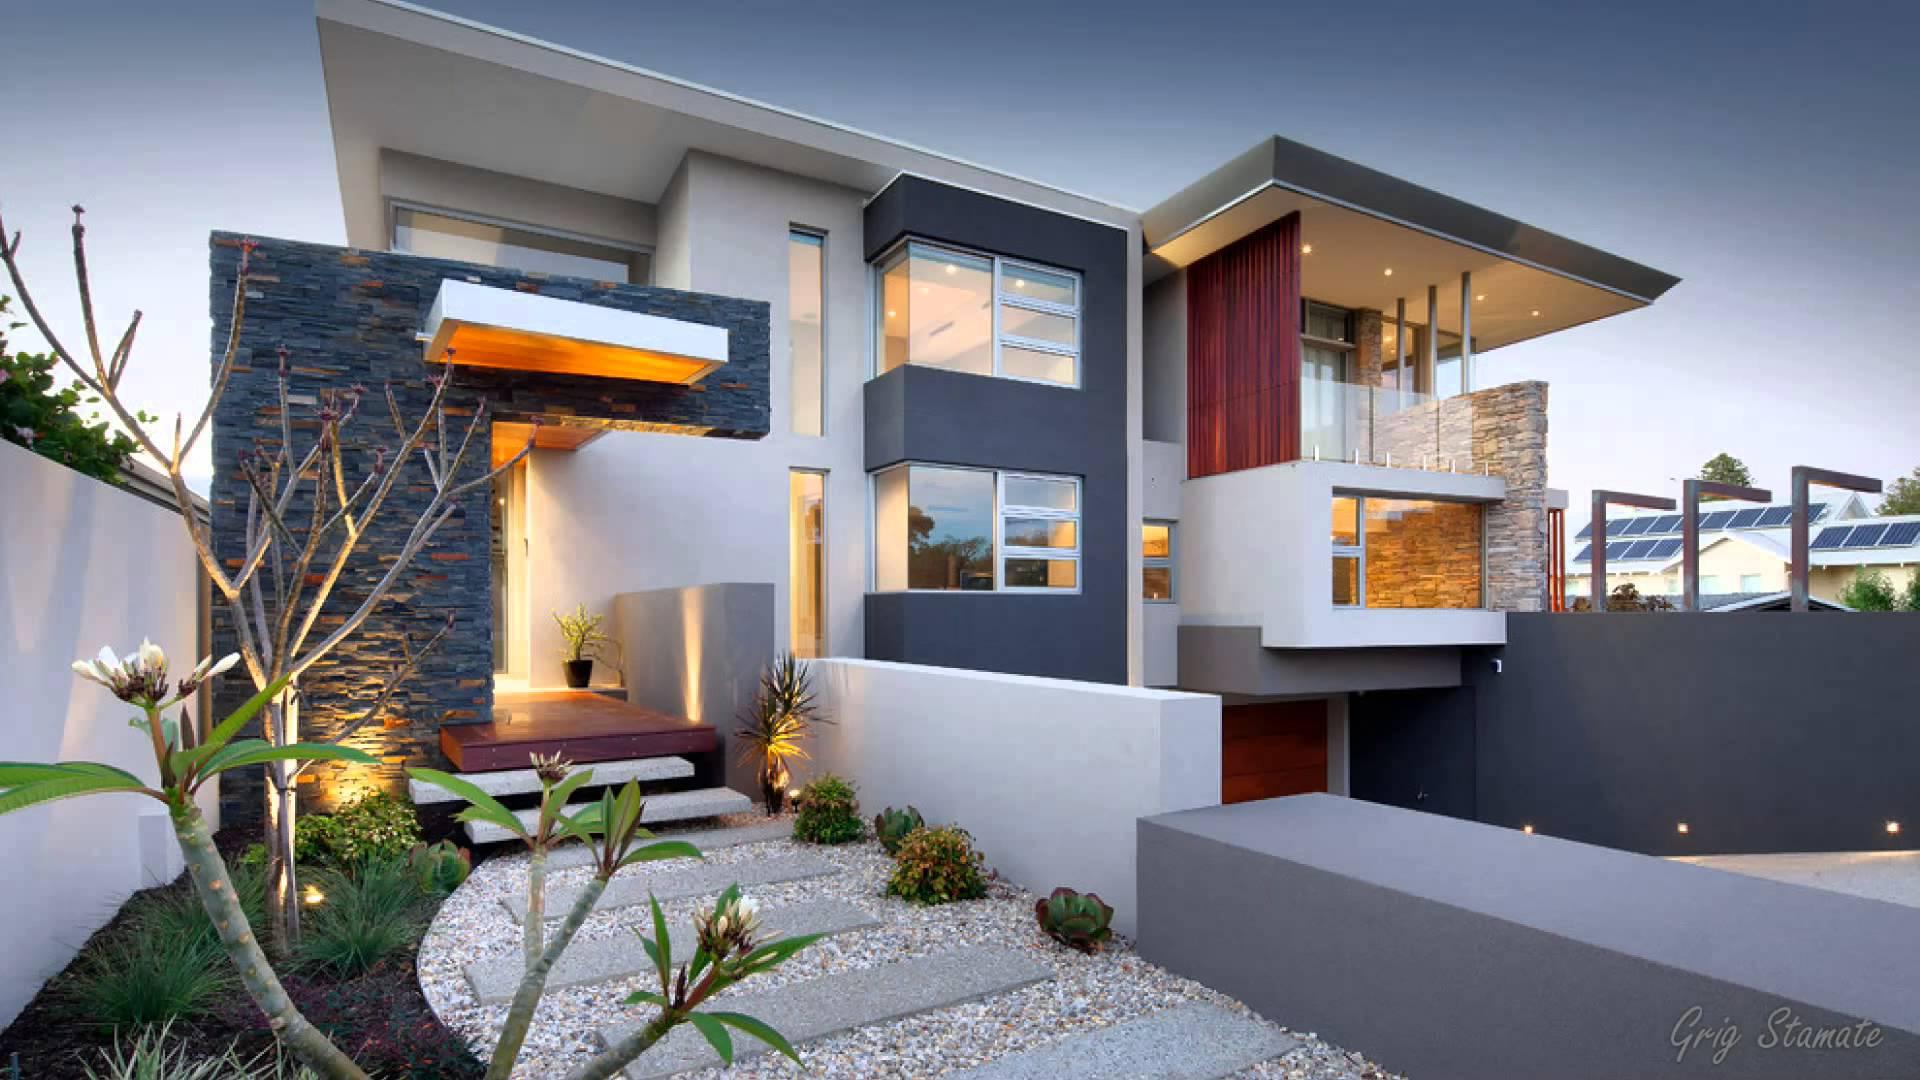 stunning ultra modern house designs - youtube RJUMZQT